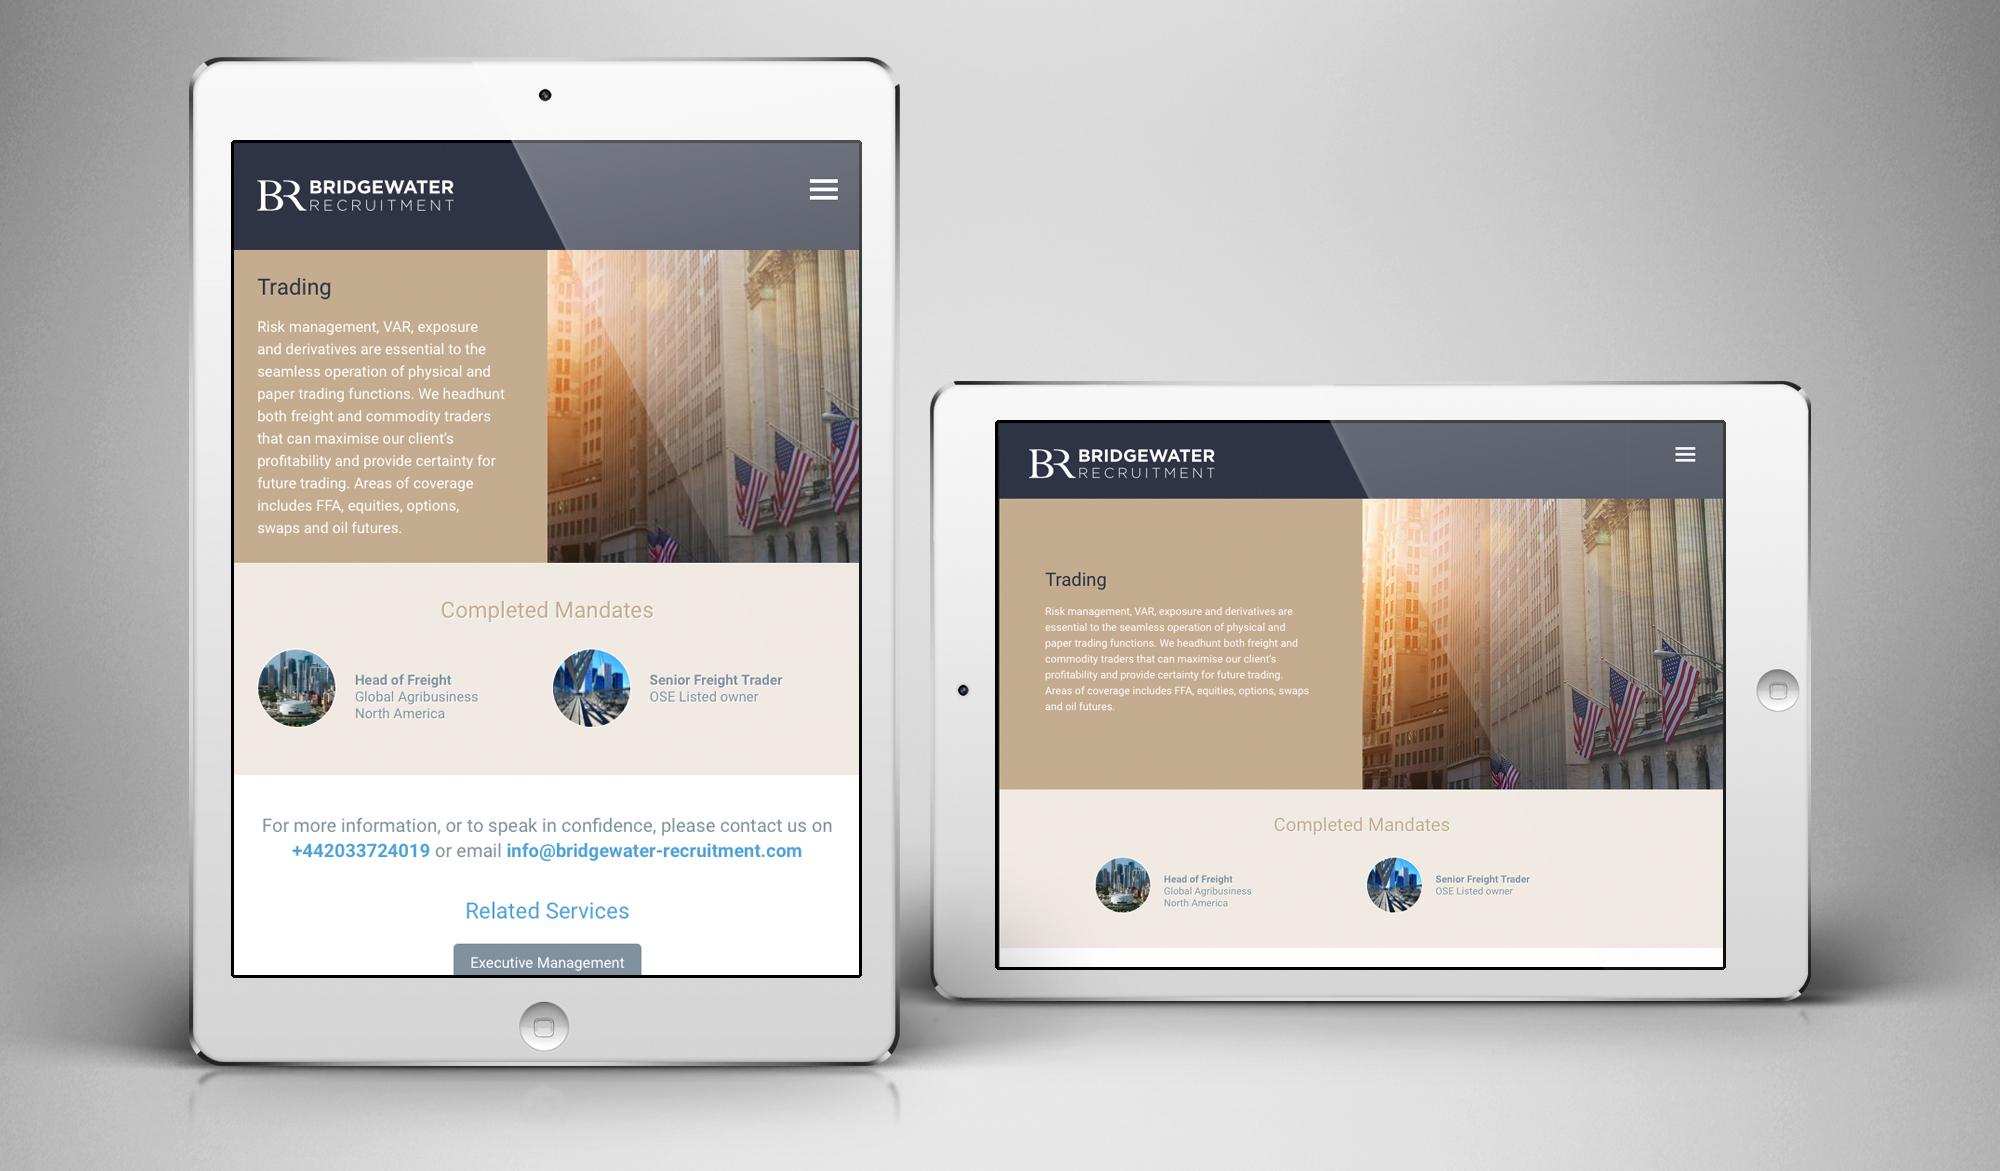 Bridgewater Recruitment tablet views